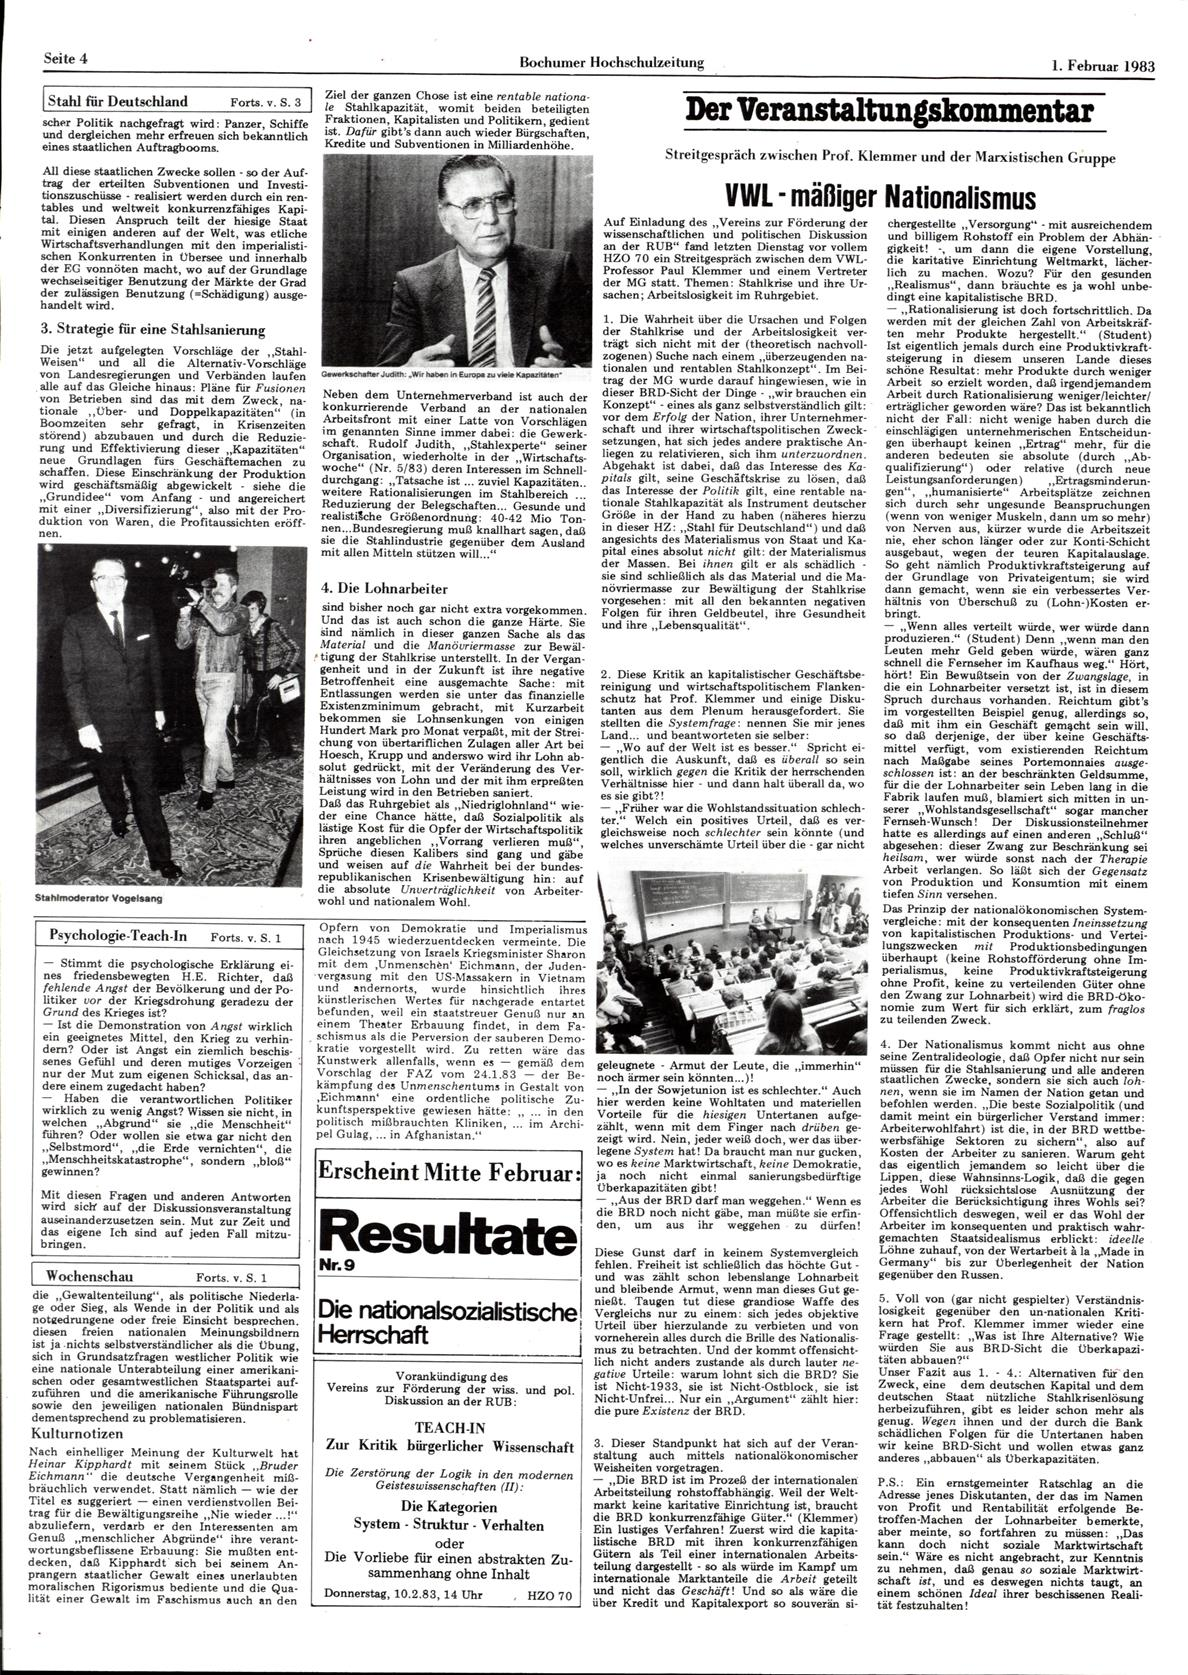 Bochum_BHZ_19830201_065_004